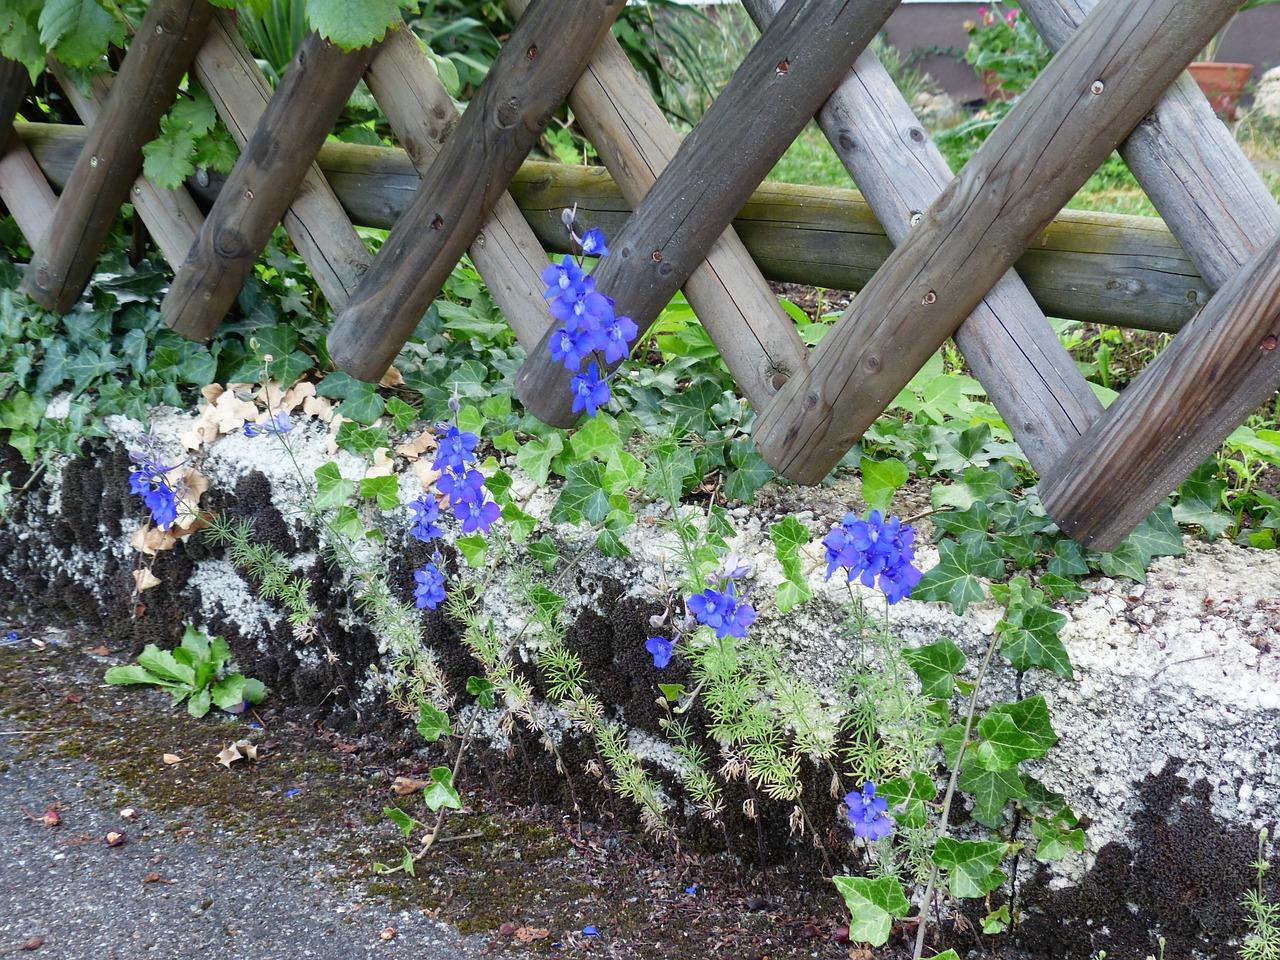 Delphinium-flowers-24-hours-london-flower-english-garden-flowers-london-florist